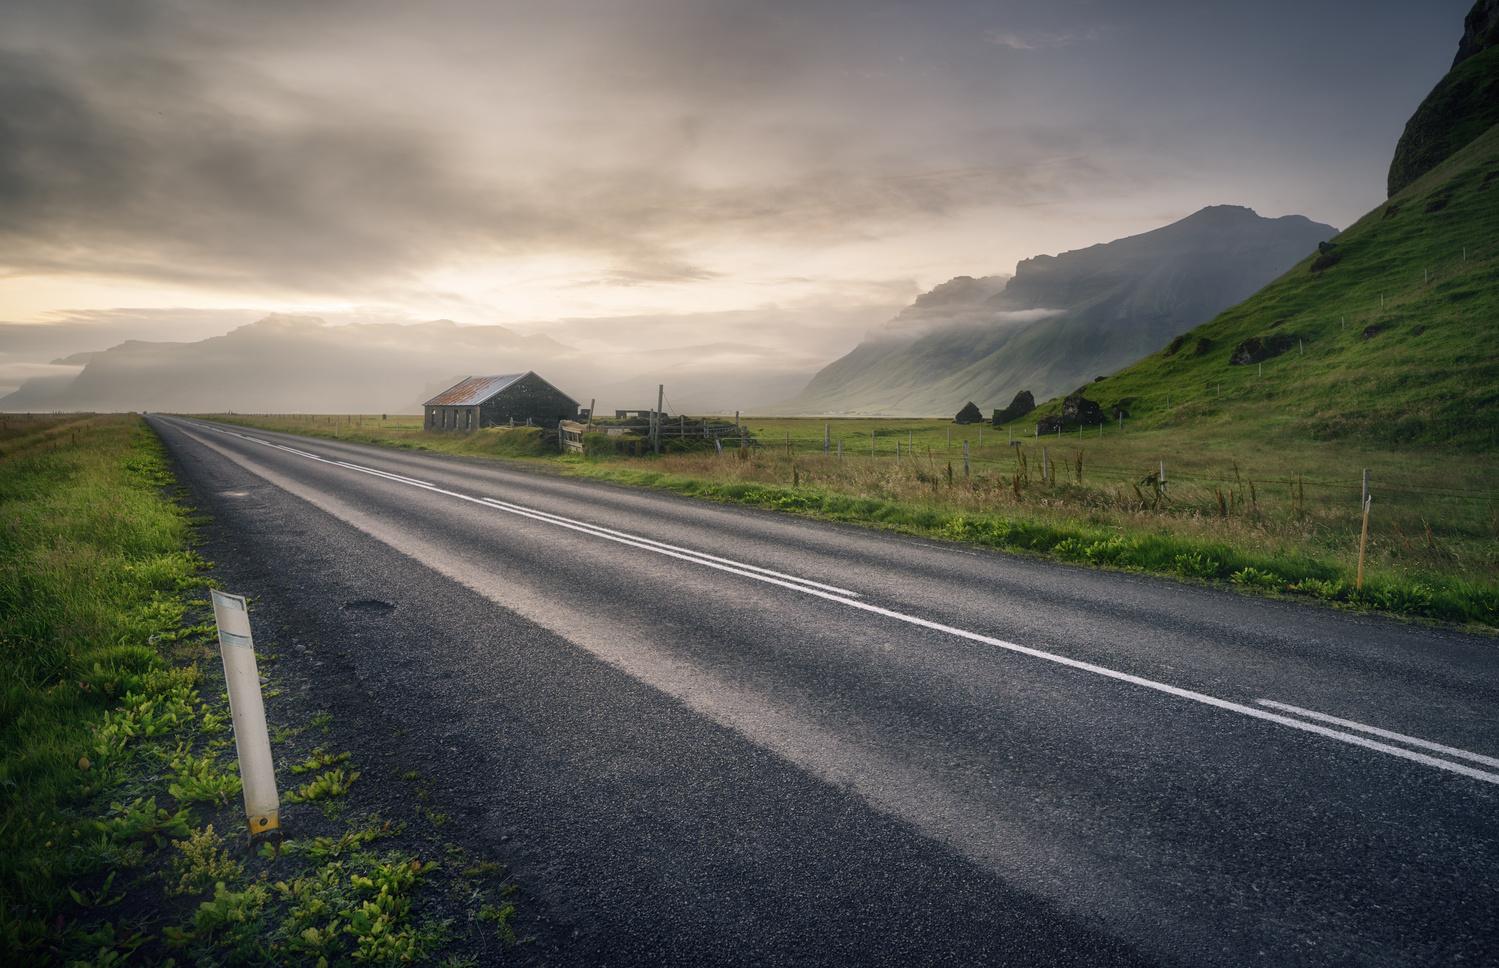 Wonders of the Ring Road by DaniGviews /Daniel